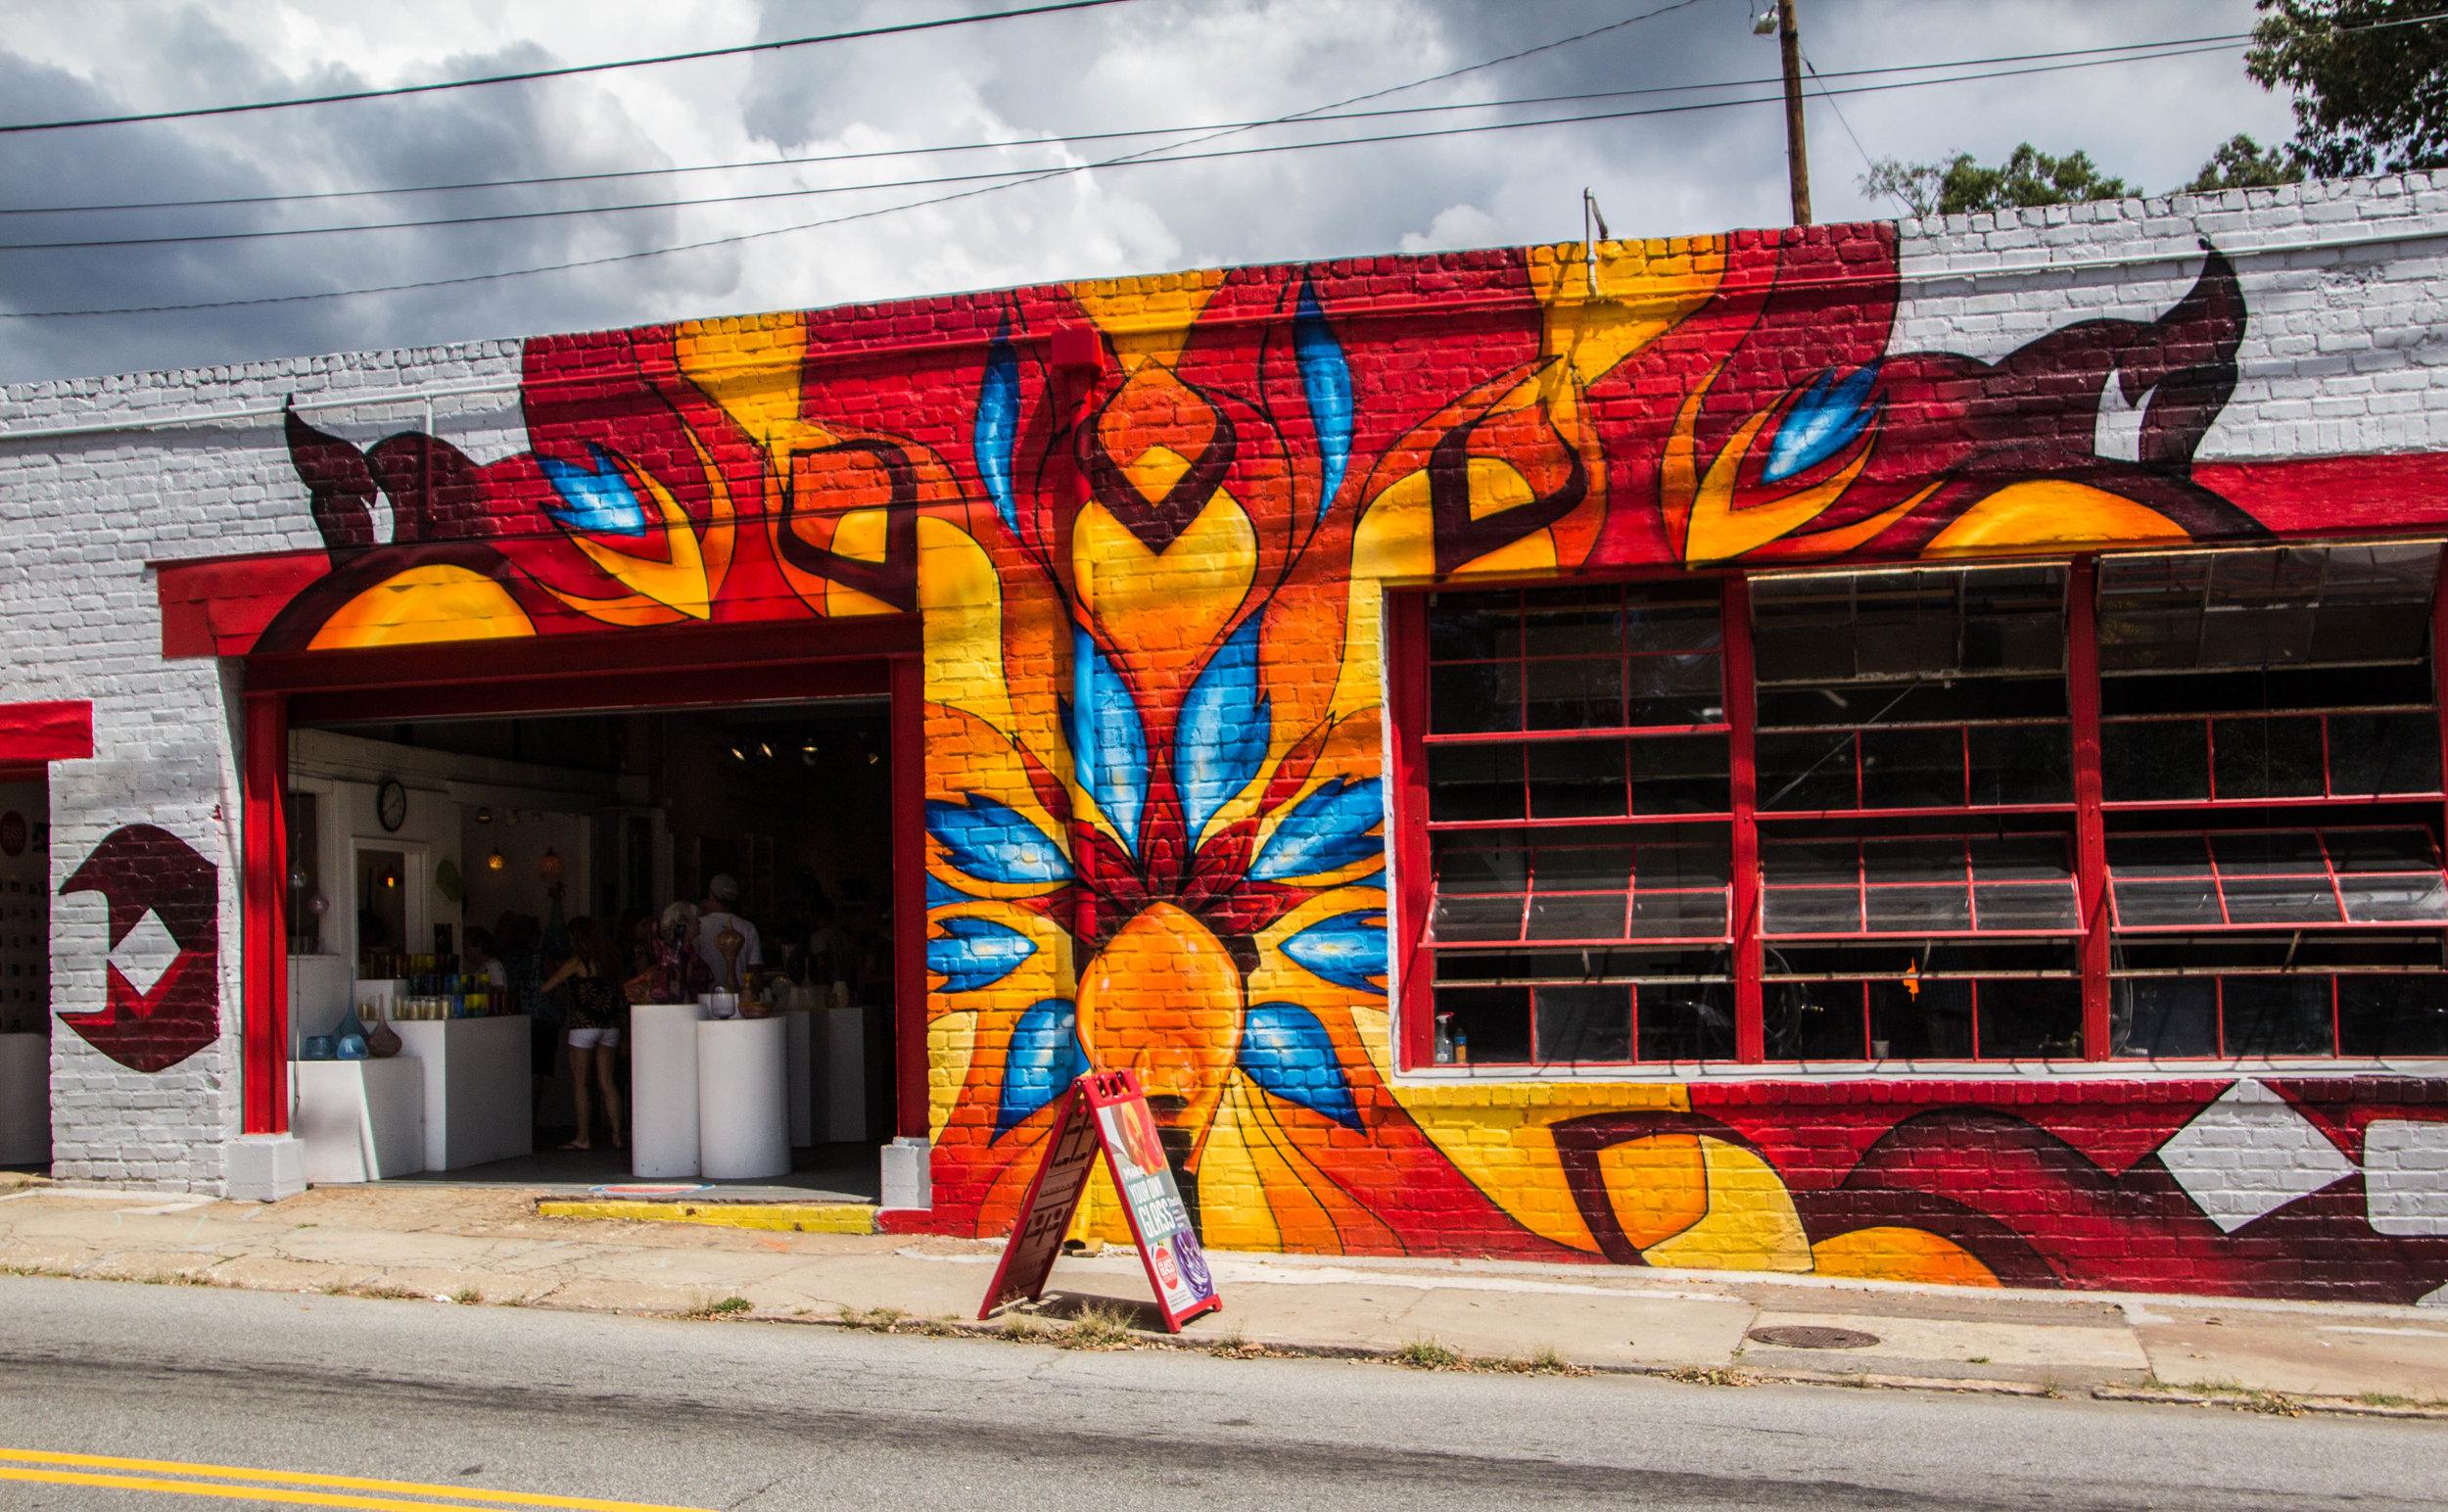 street-art-asheville-north-carolina-19.jpg